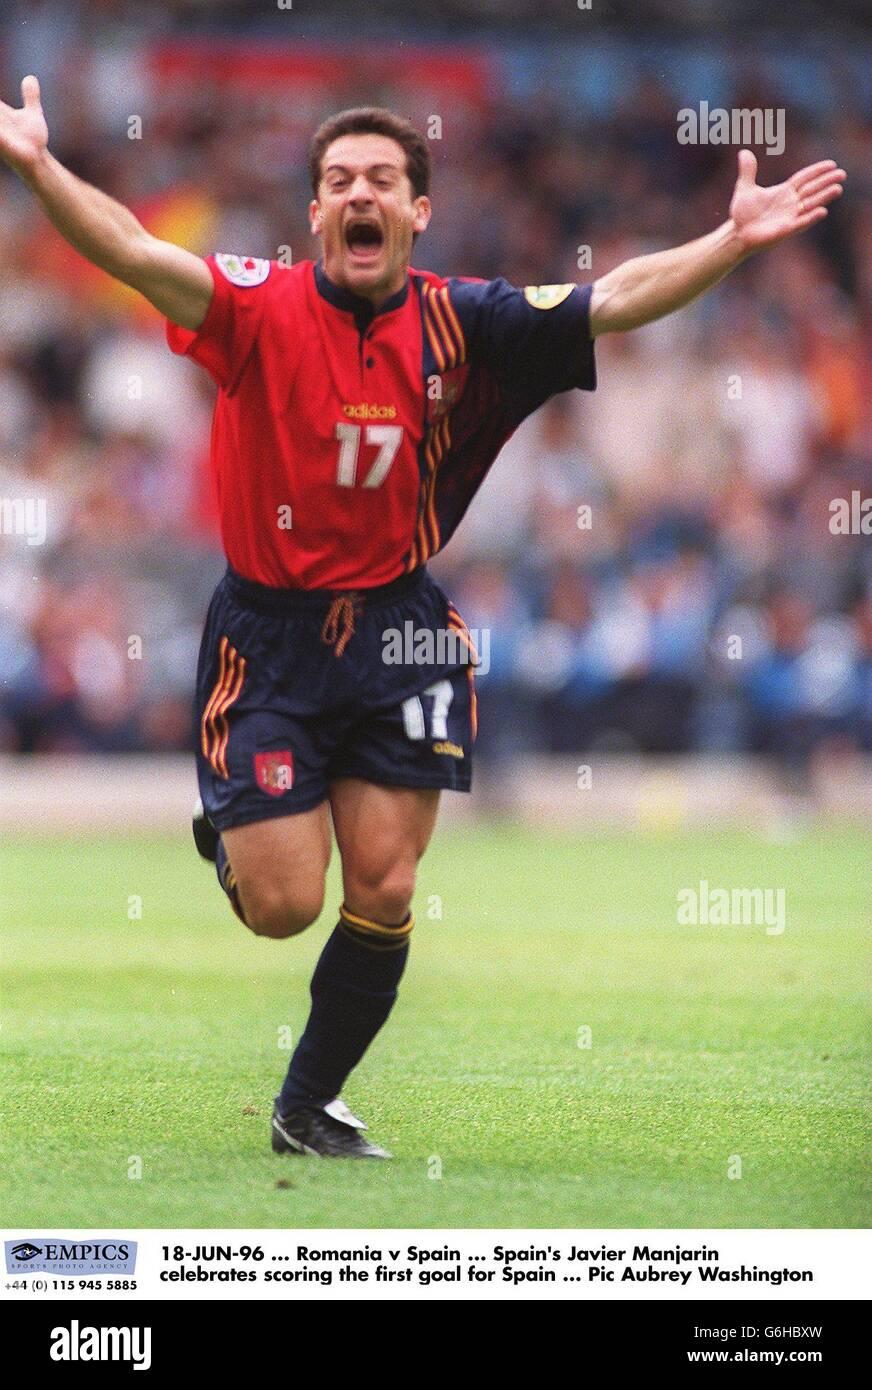 Spain's Javier Manjarin celebrates scoring the first goal for Spain Stock Photo